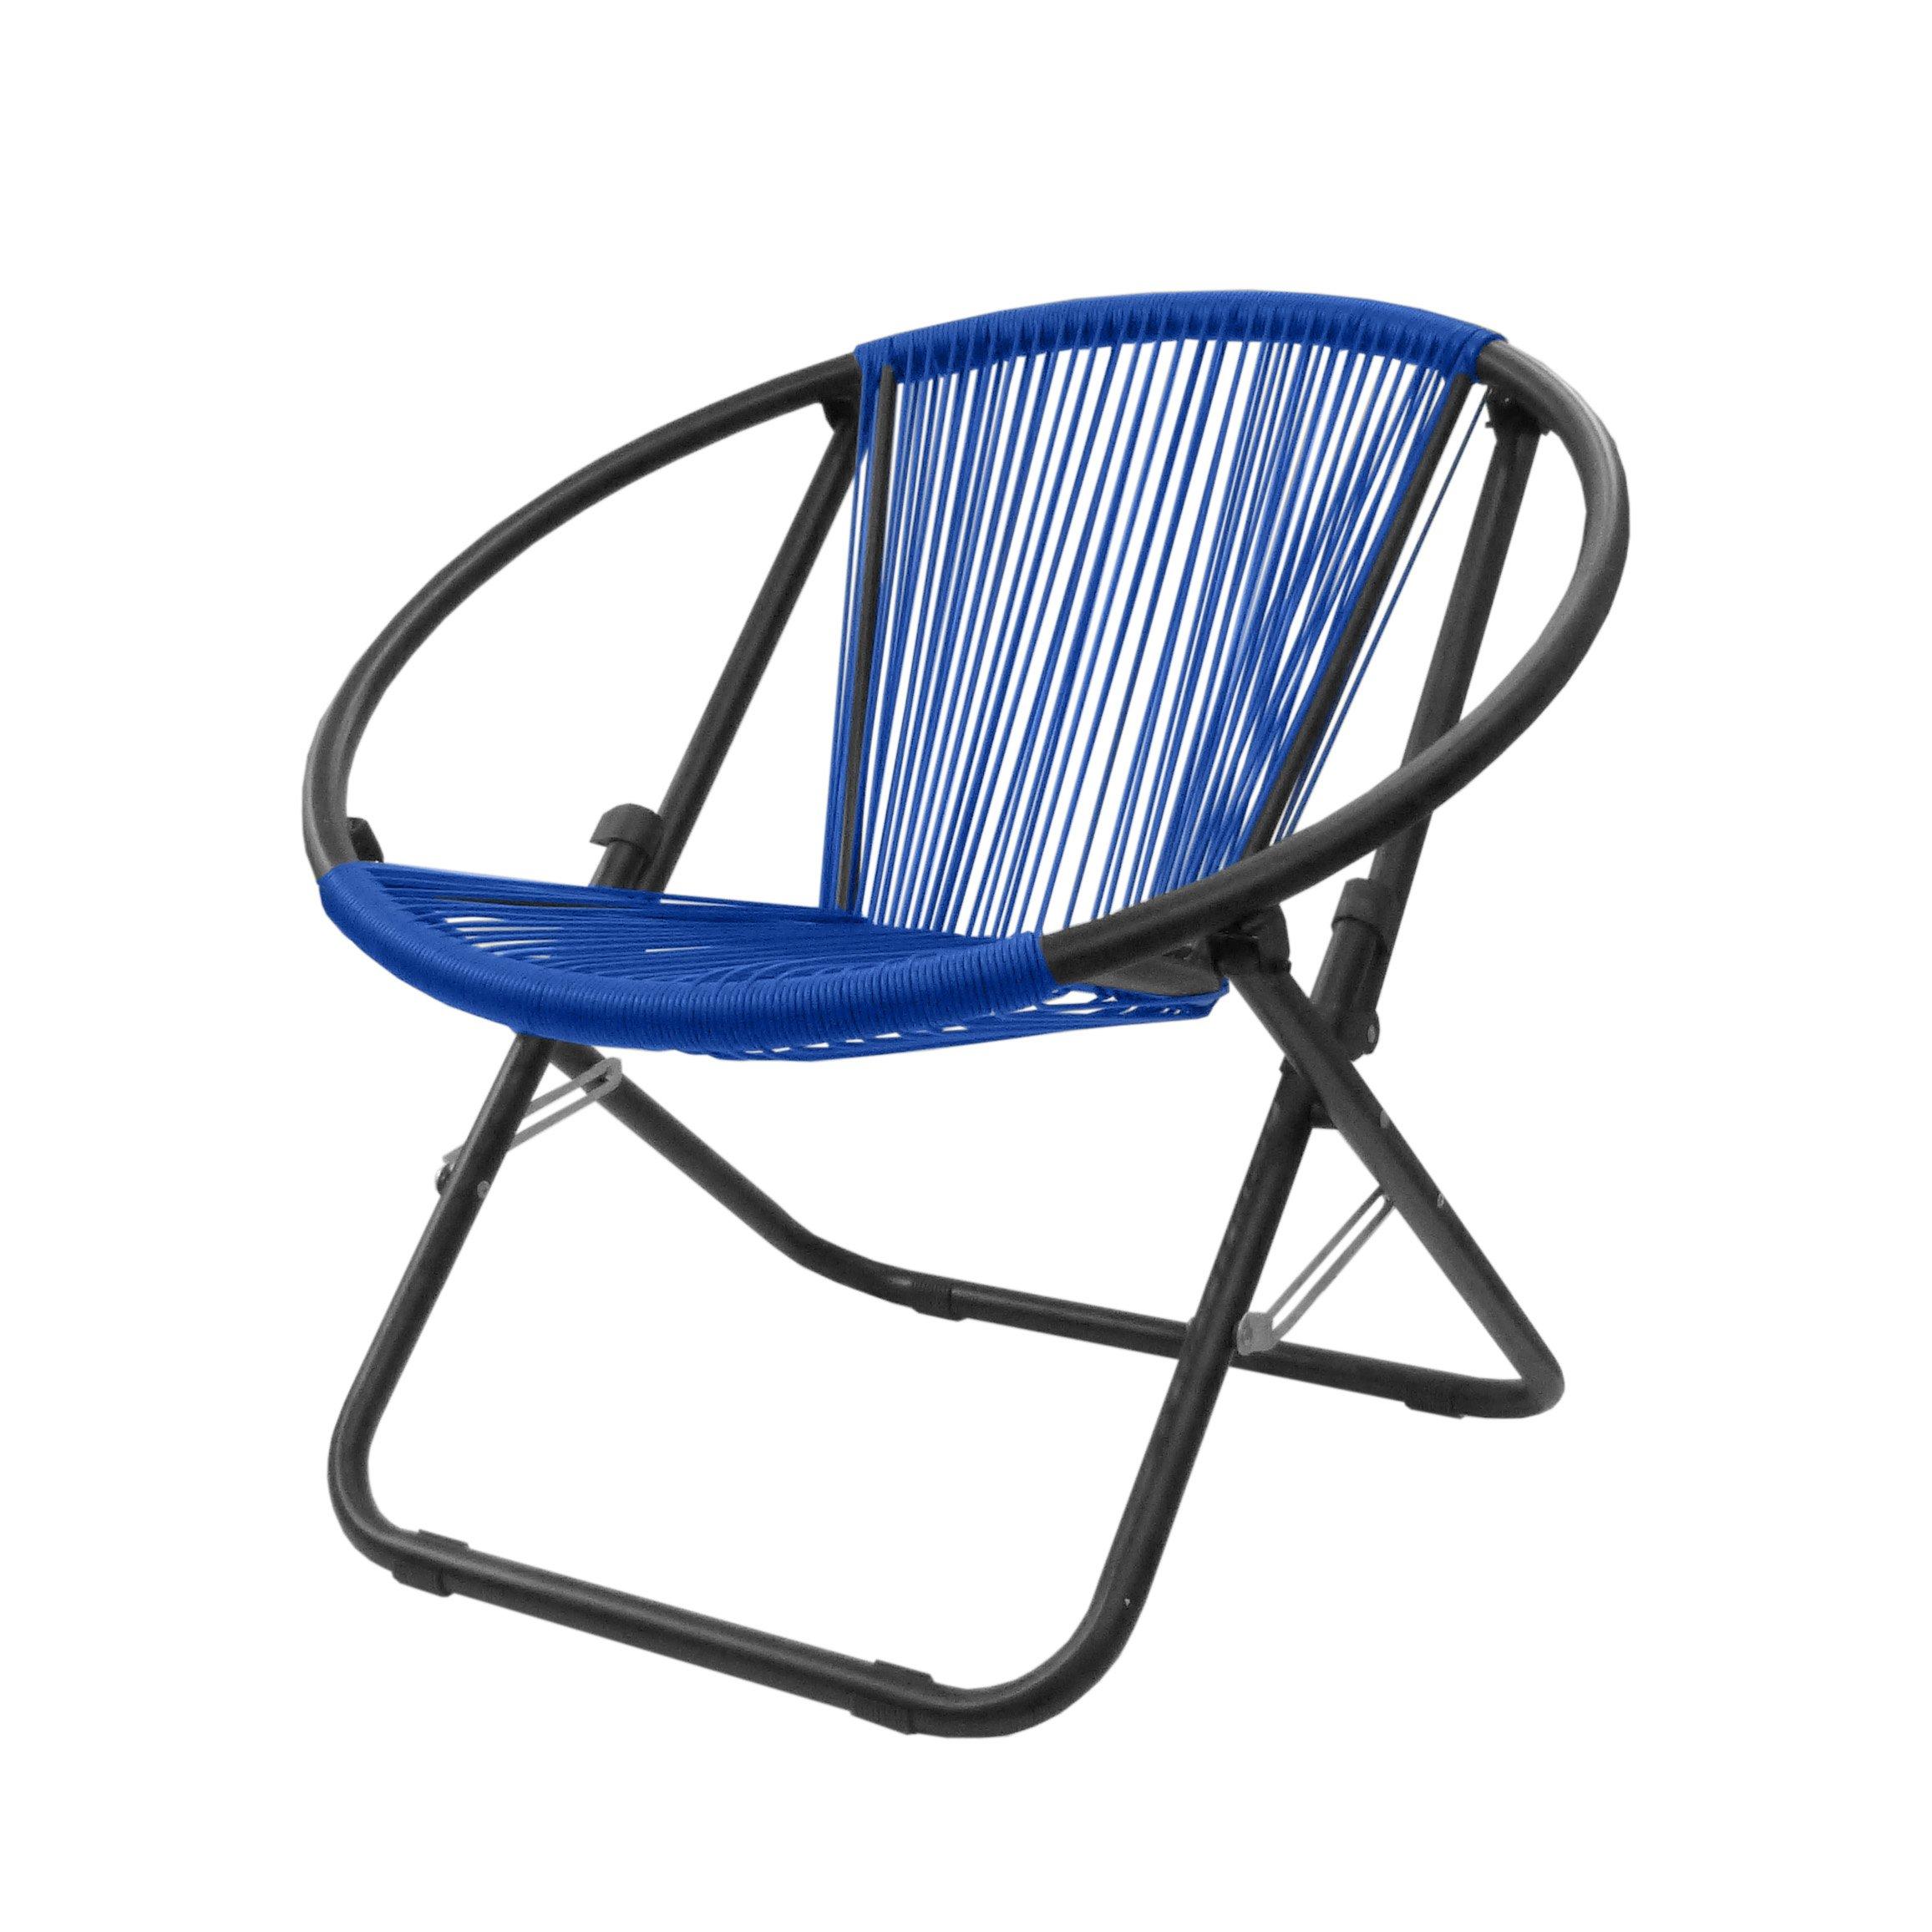 Urban Shop Outdoor Woven Chair, Royal Blue by Urban Shop